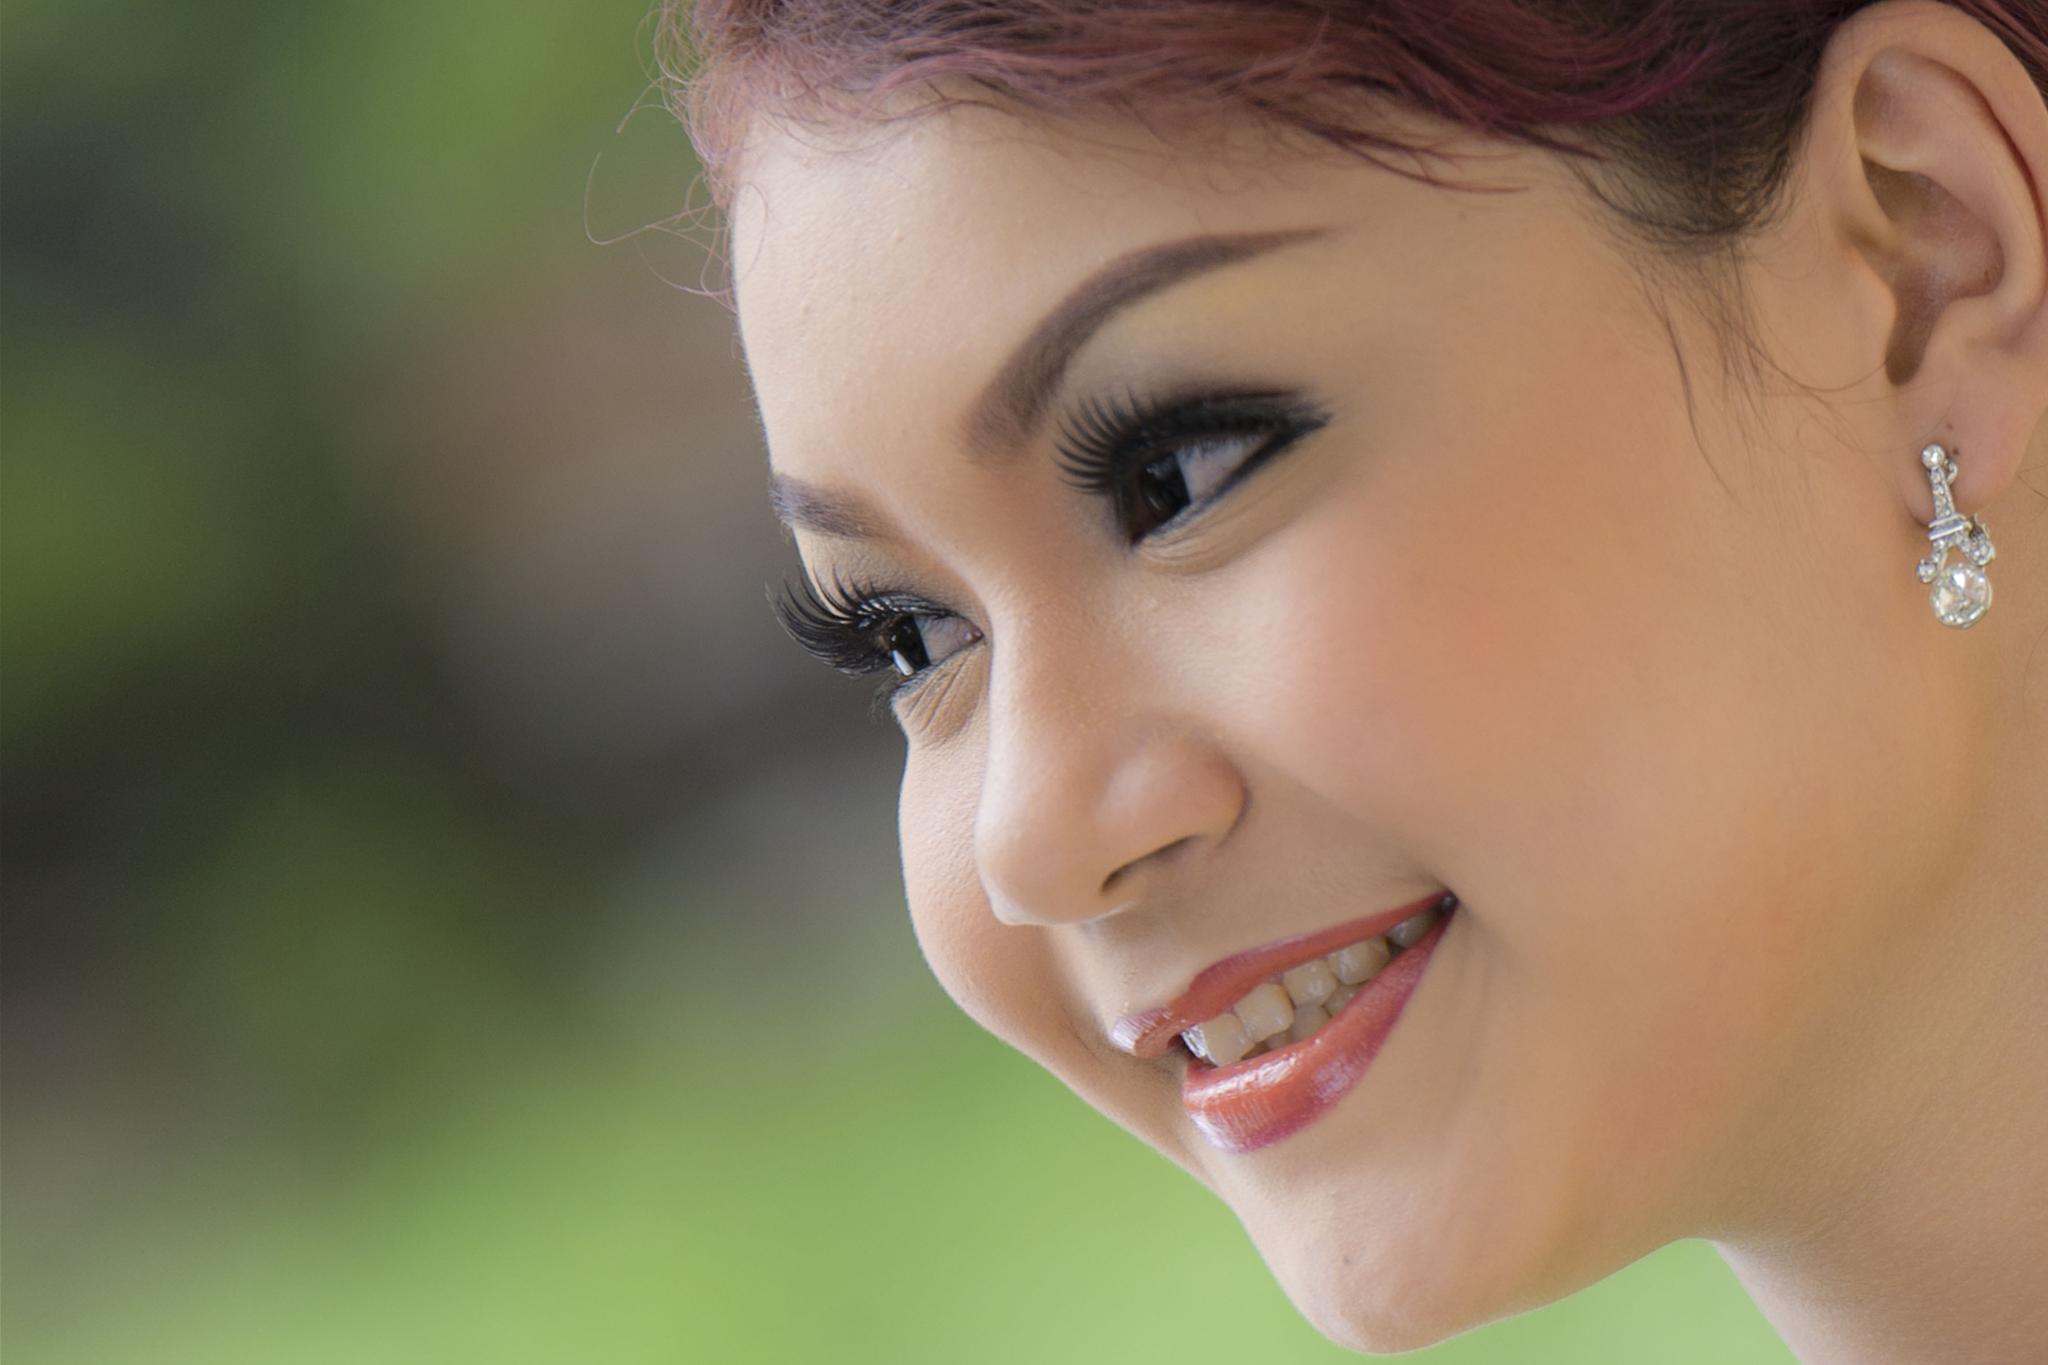 SMILE by tonyyehtetaung